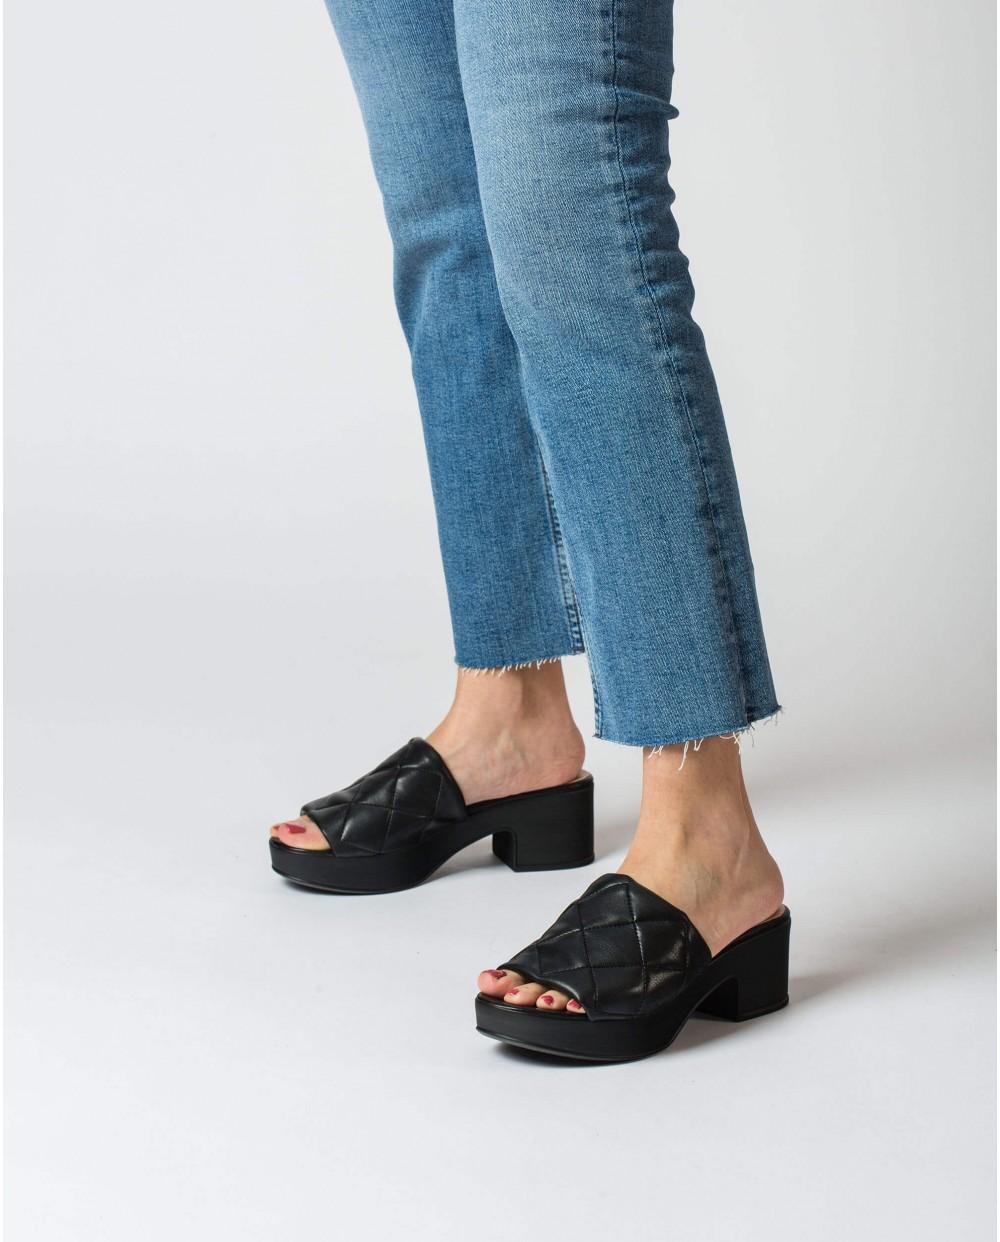 Wonders-Sandals-Padded clog